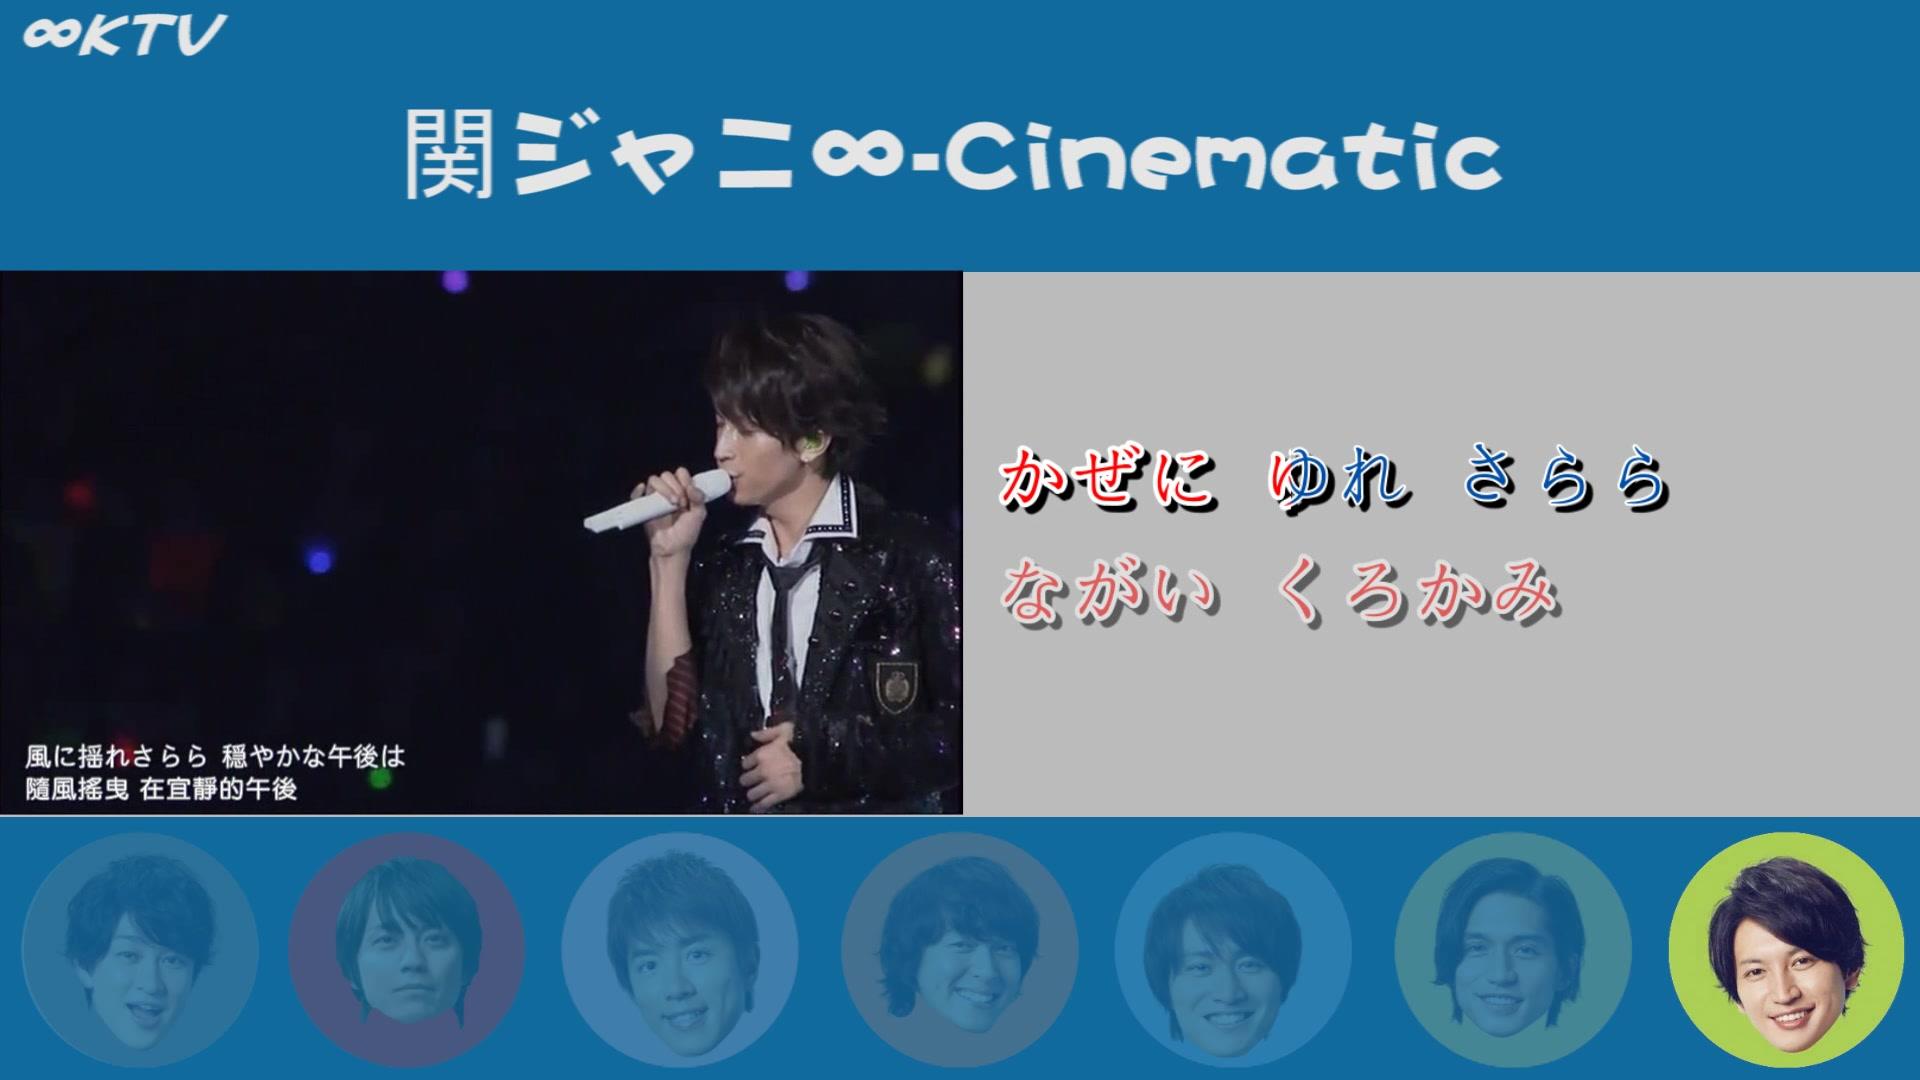 【∞KTV】関ジャニ∞ -cinematic【關8】日文假名-卡拉OK_嗶哩嗶哩 (゜-゜)つロ 干杯~-bilibili